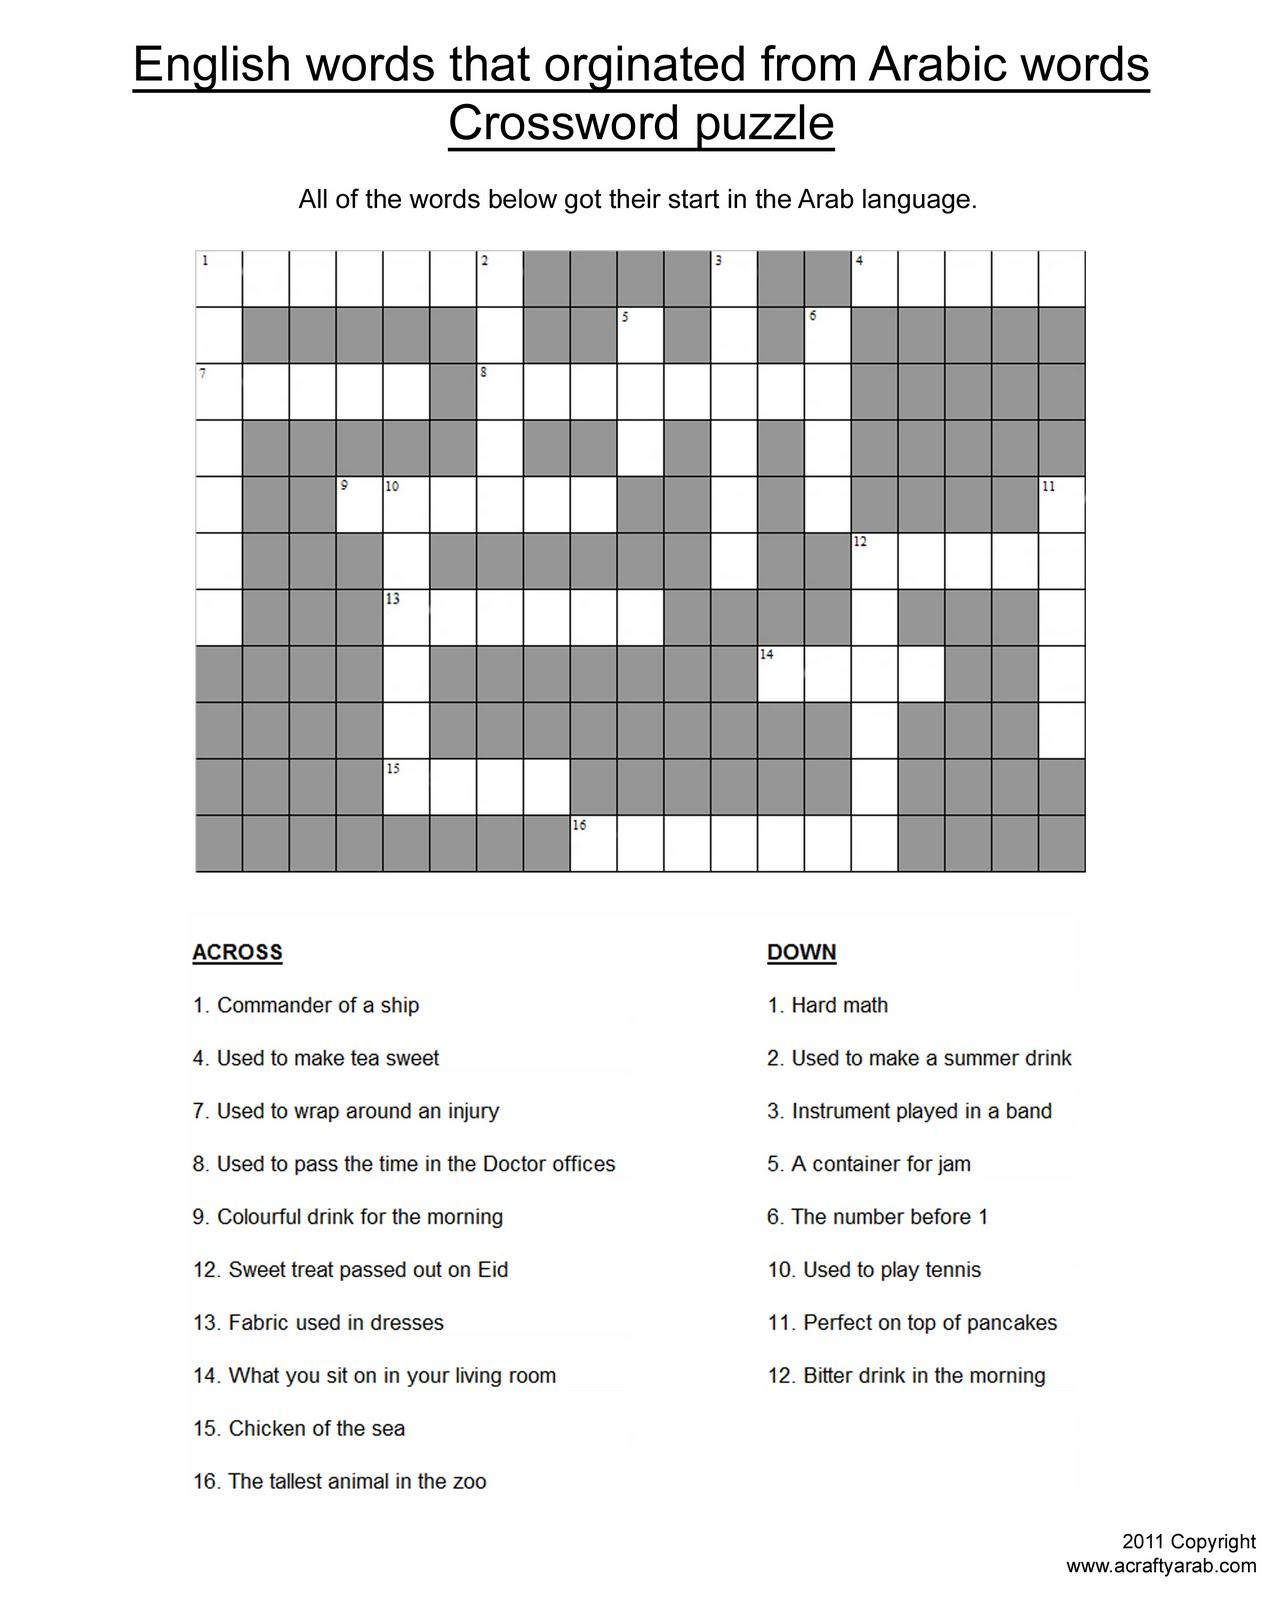 Arabic Word Origins Crossword Puzzle Printable